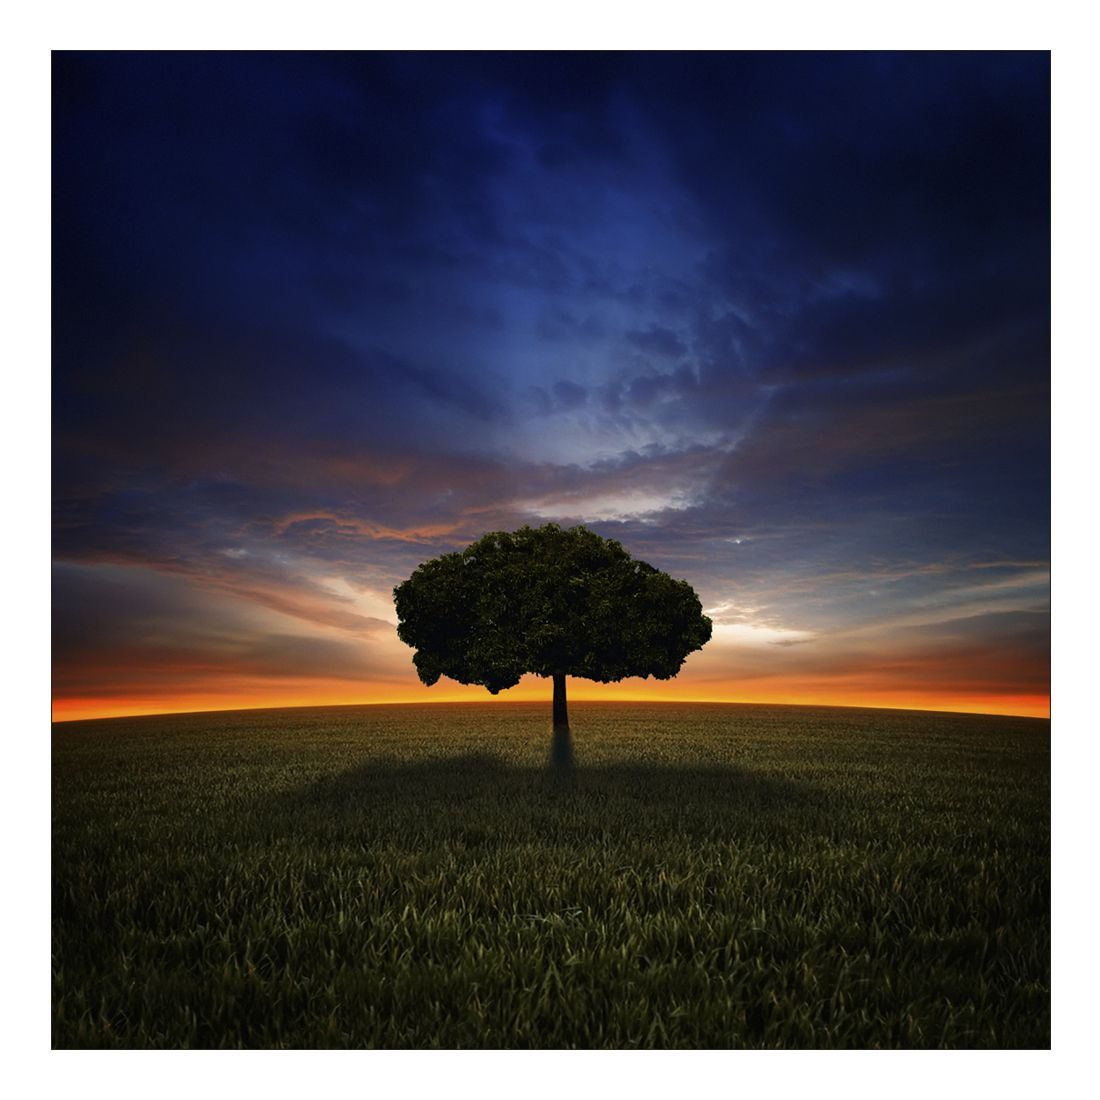 Leinwandbild MYSTICAL TREE ON FIELD – Abmessung 100 x 50 cm, Gallery of Innovative Art günstig online kaufen